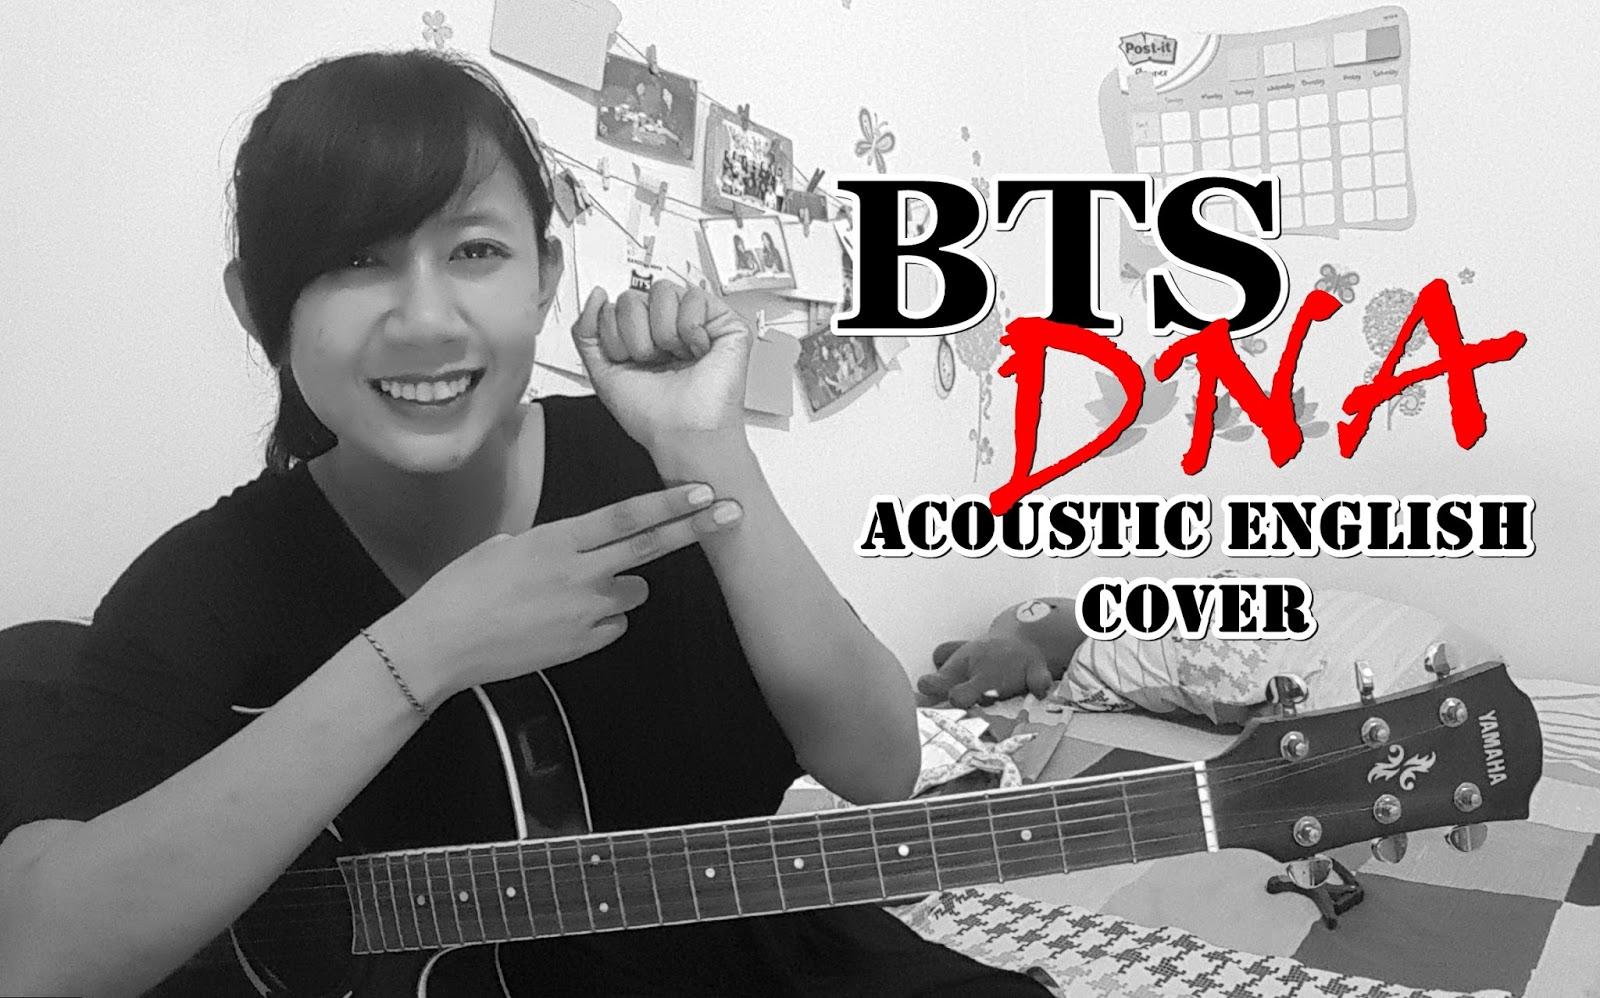 leereeya: [CHORDS] BTS 방탄소년단 - DNA Acoustic English Cover